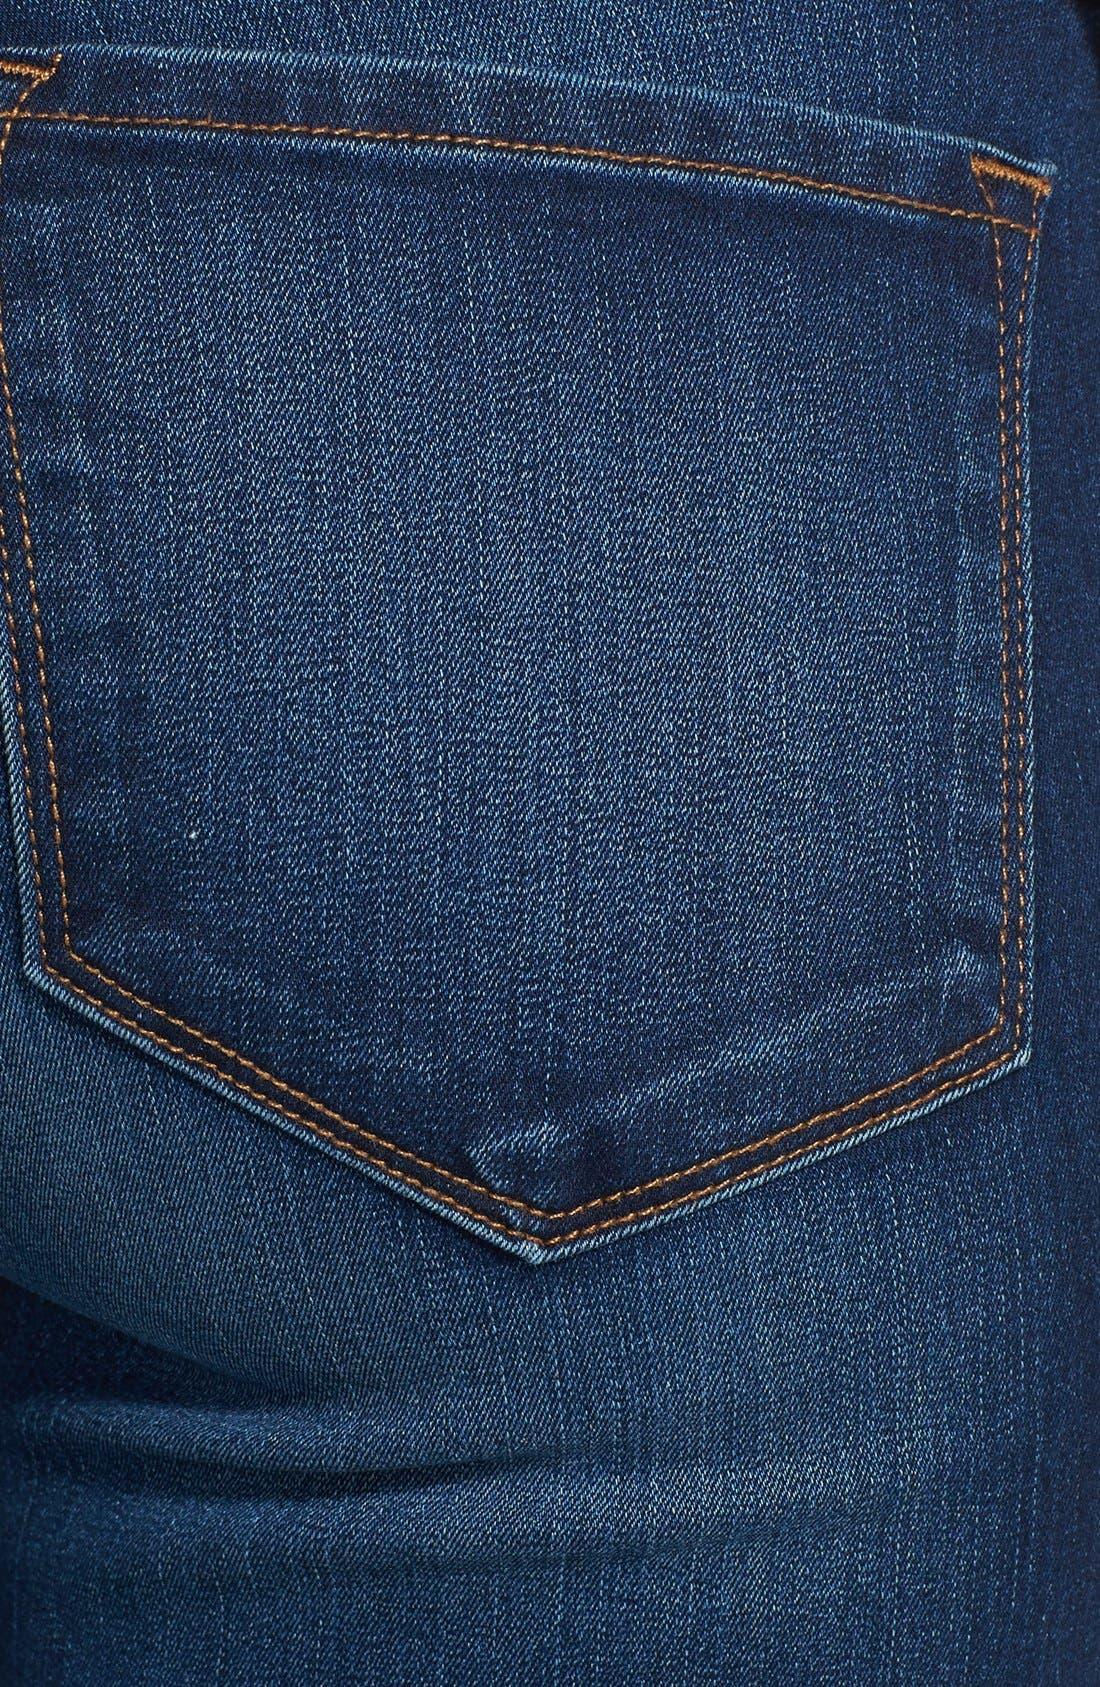 '811' Ankle Skinny Jeans,                             Alternate thumbnail 11, color,